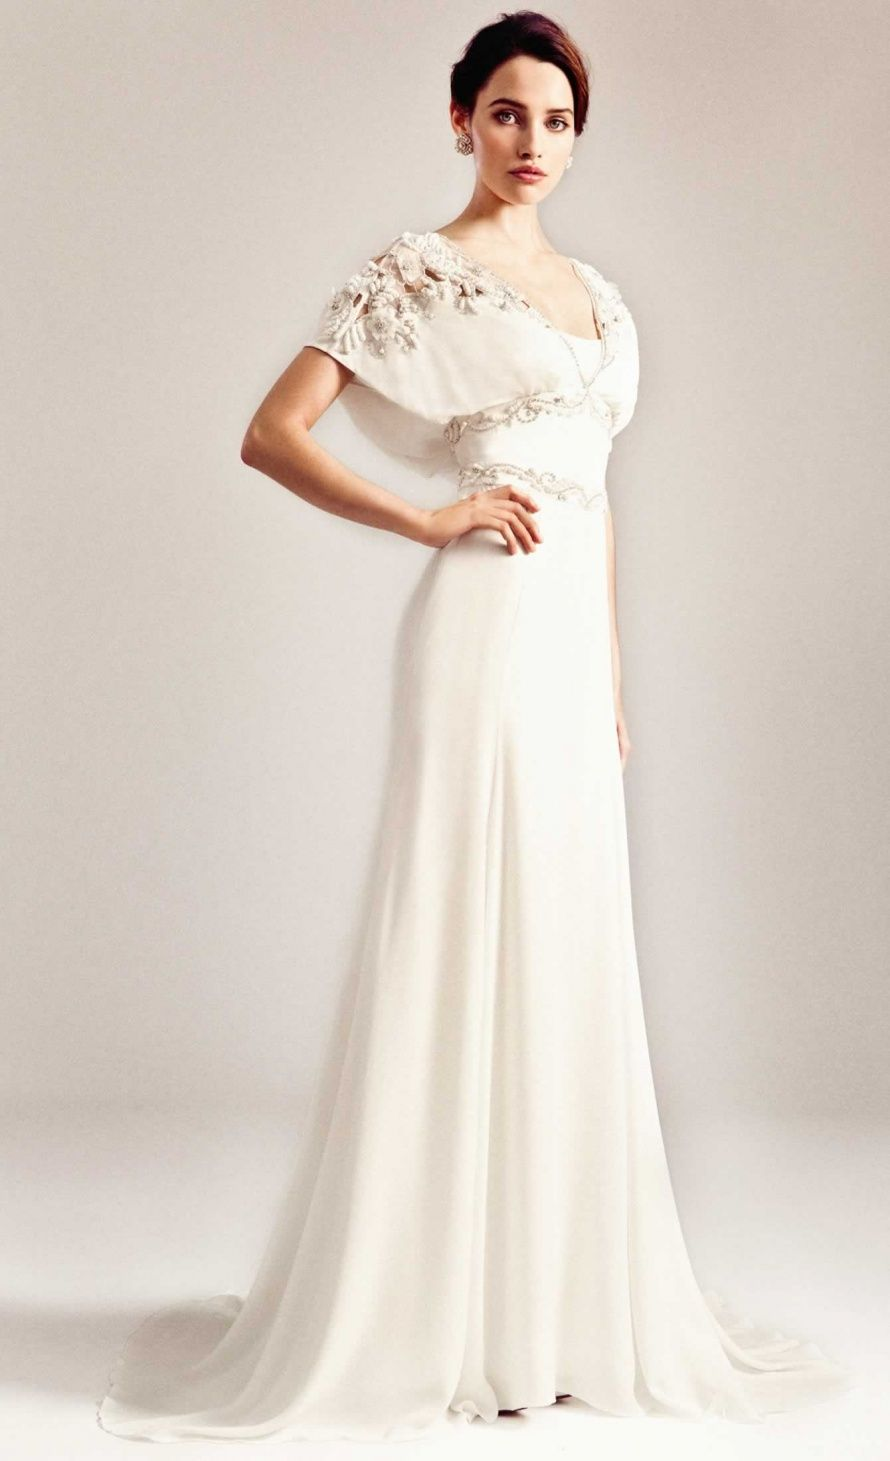 15Y RTW Look 6 |Willow Dress | Temperley London | ~ Wedding Gown pt2 ...